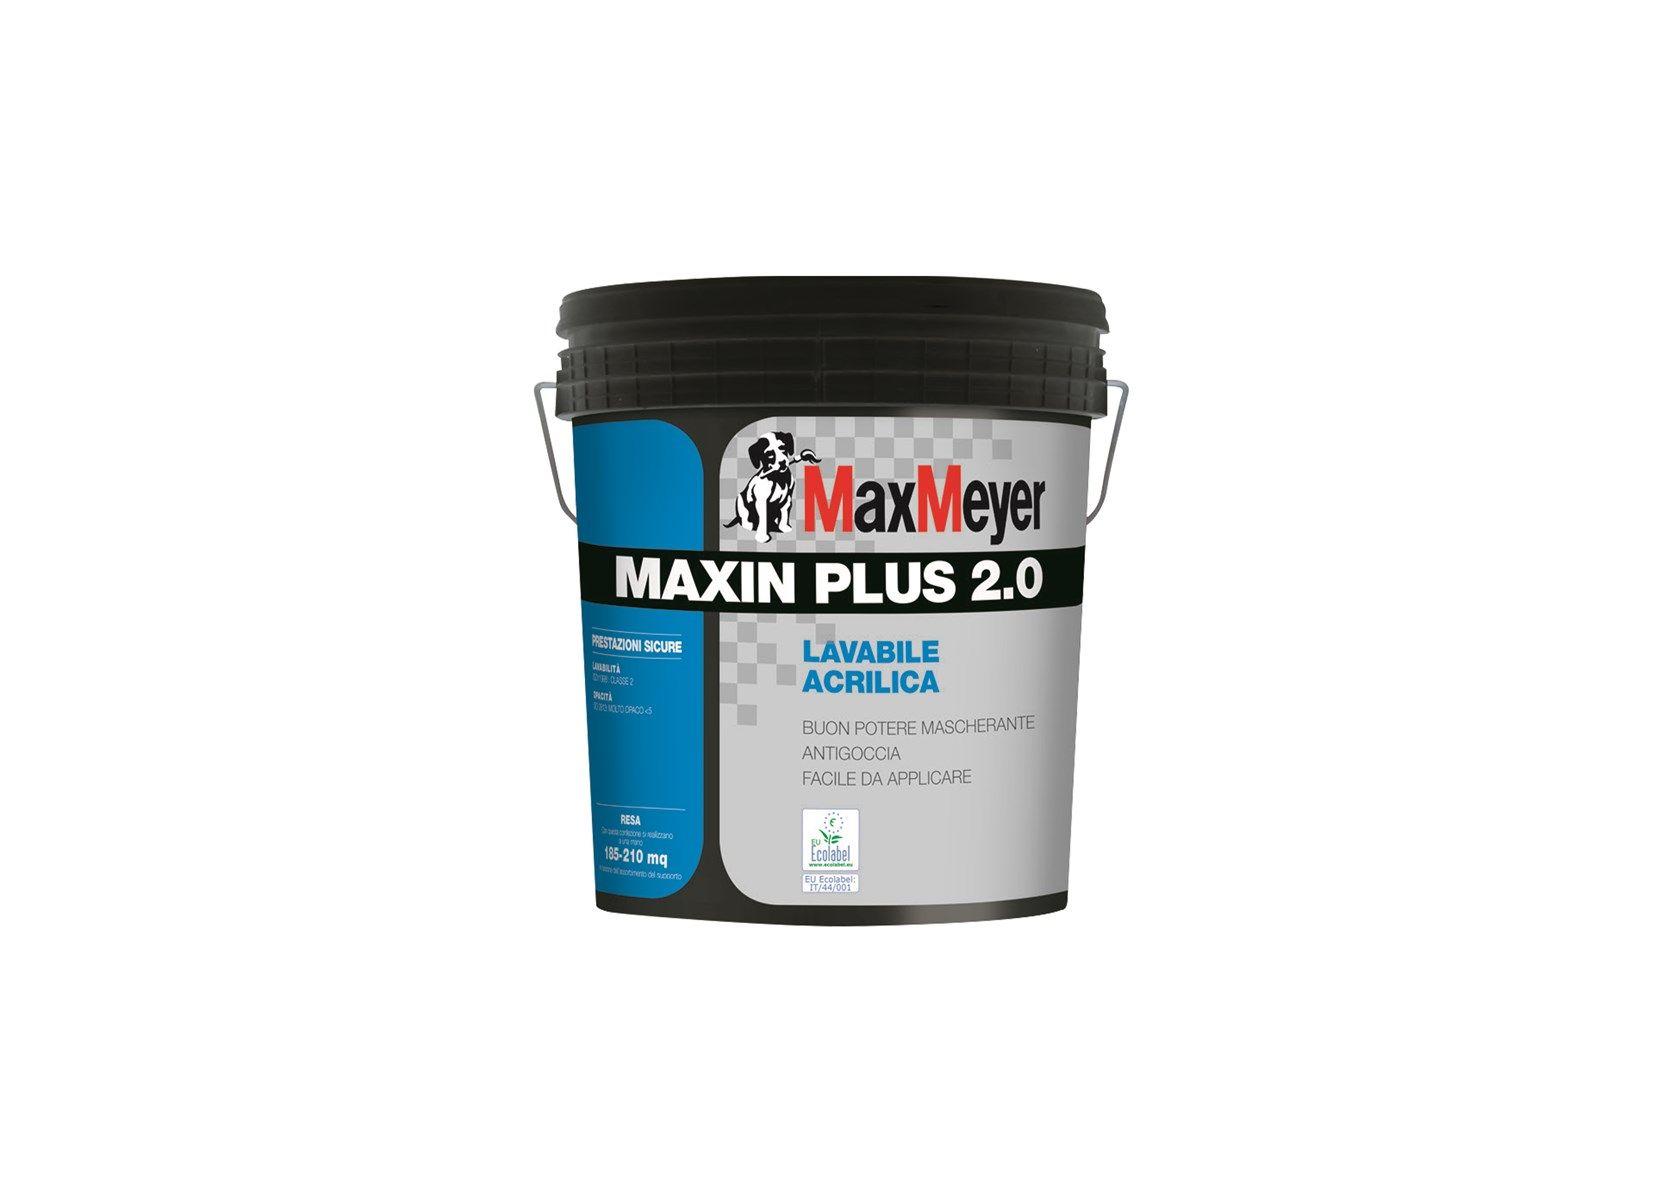 MaxMeyer presenta Maxin Plus e Maxin Plus 2.0